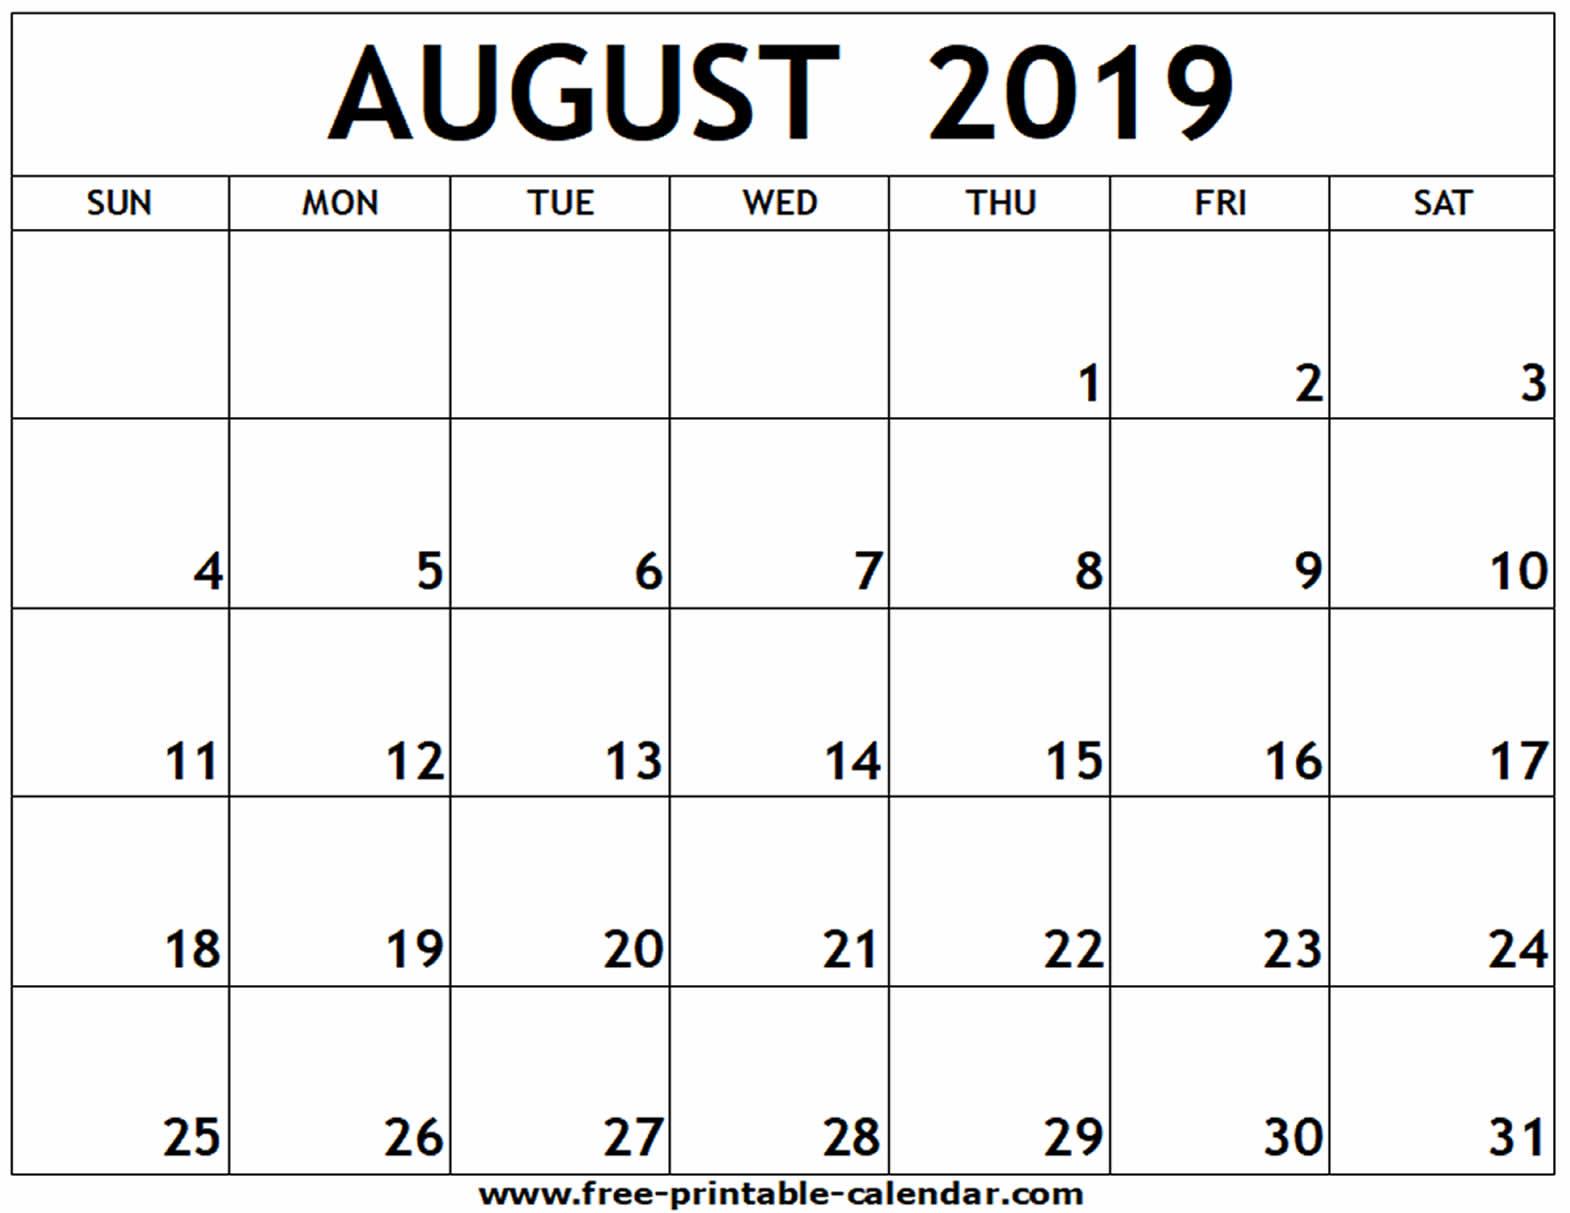 August 2019 Printable Calendar - Free-Printable-Calendar intended for Blank Calendars For August